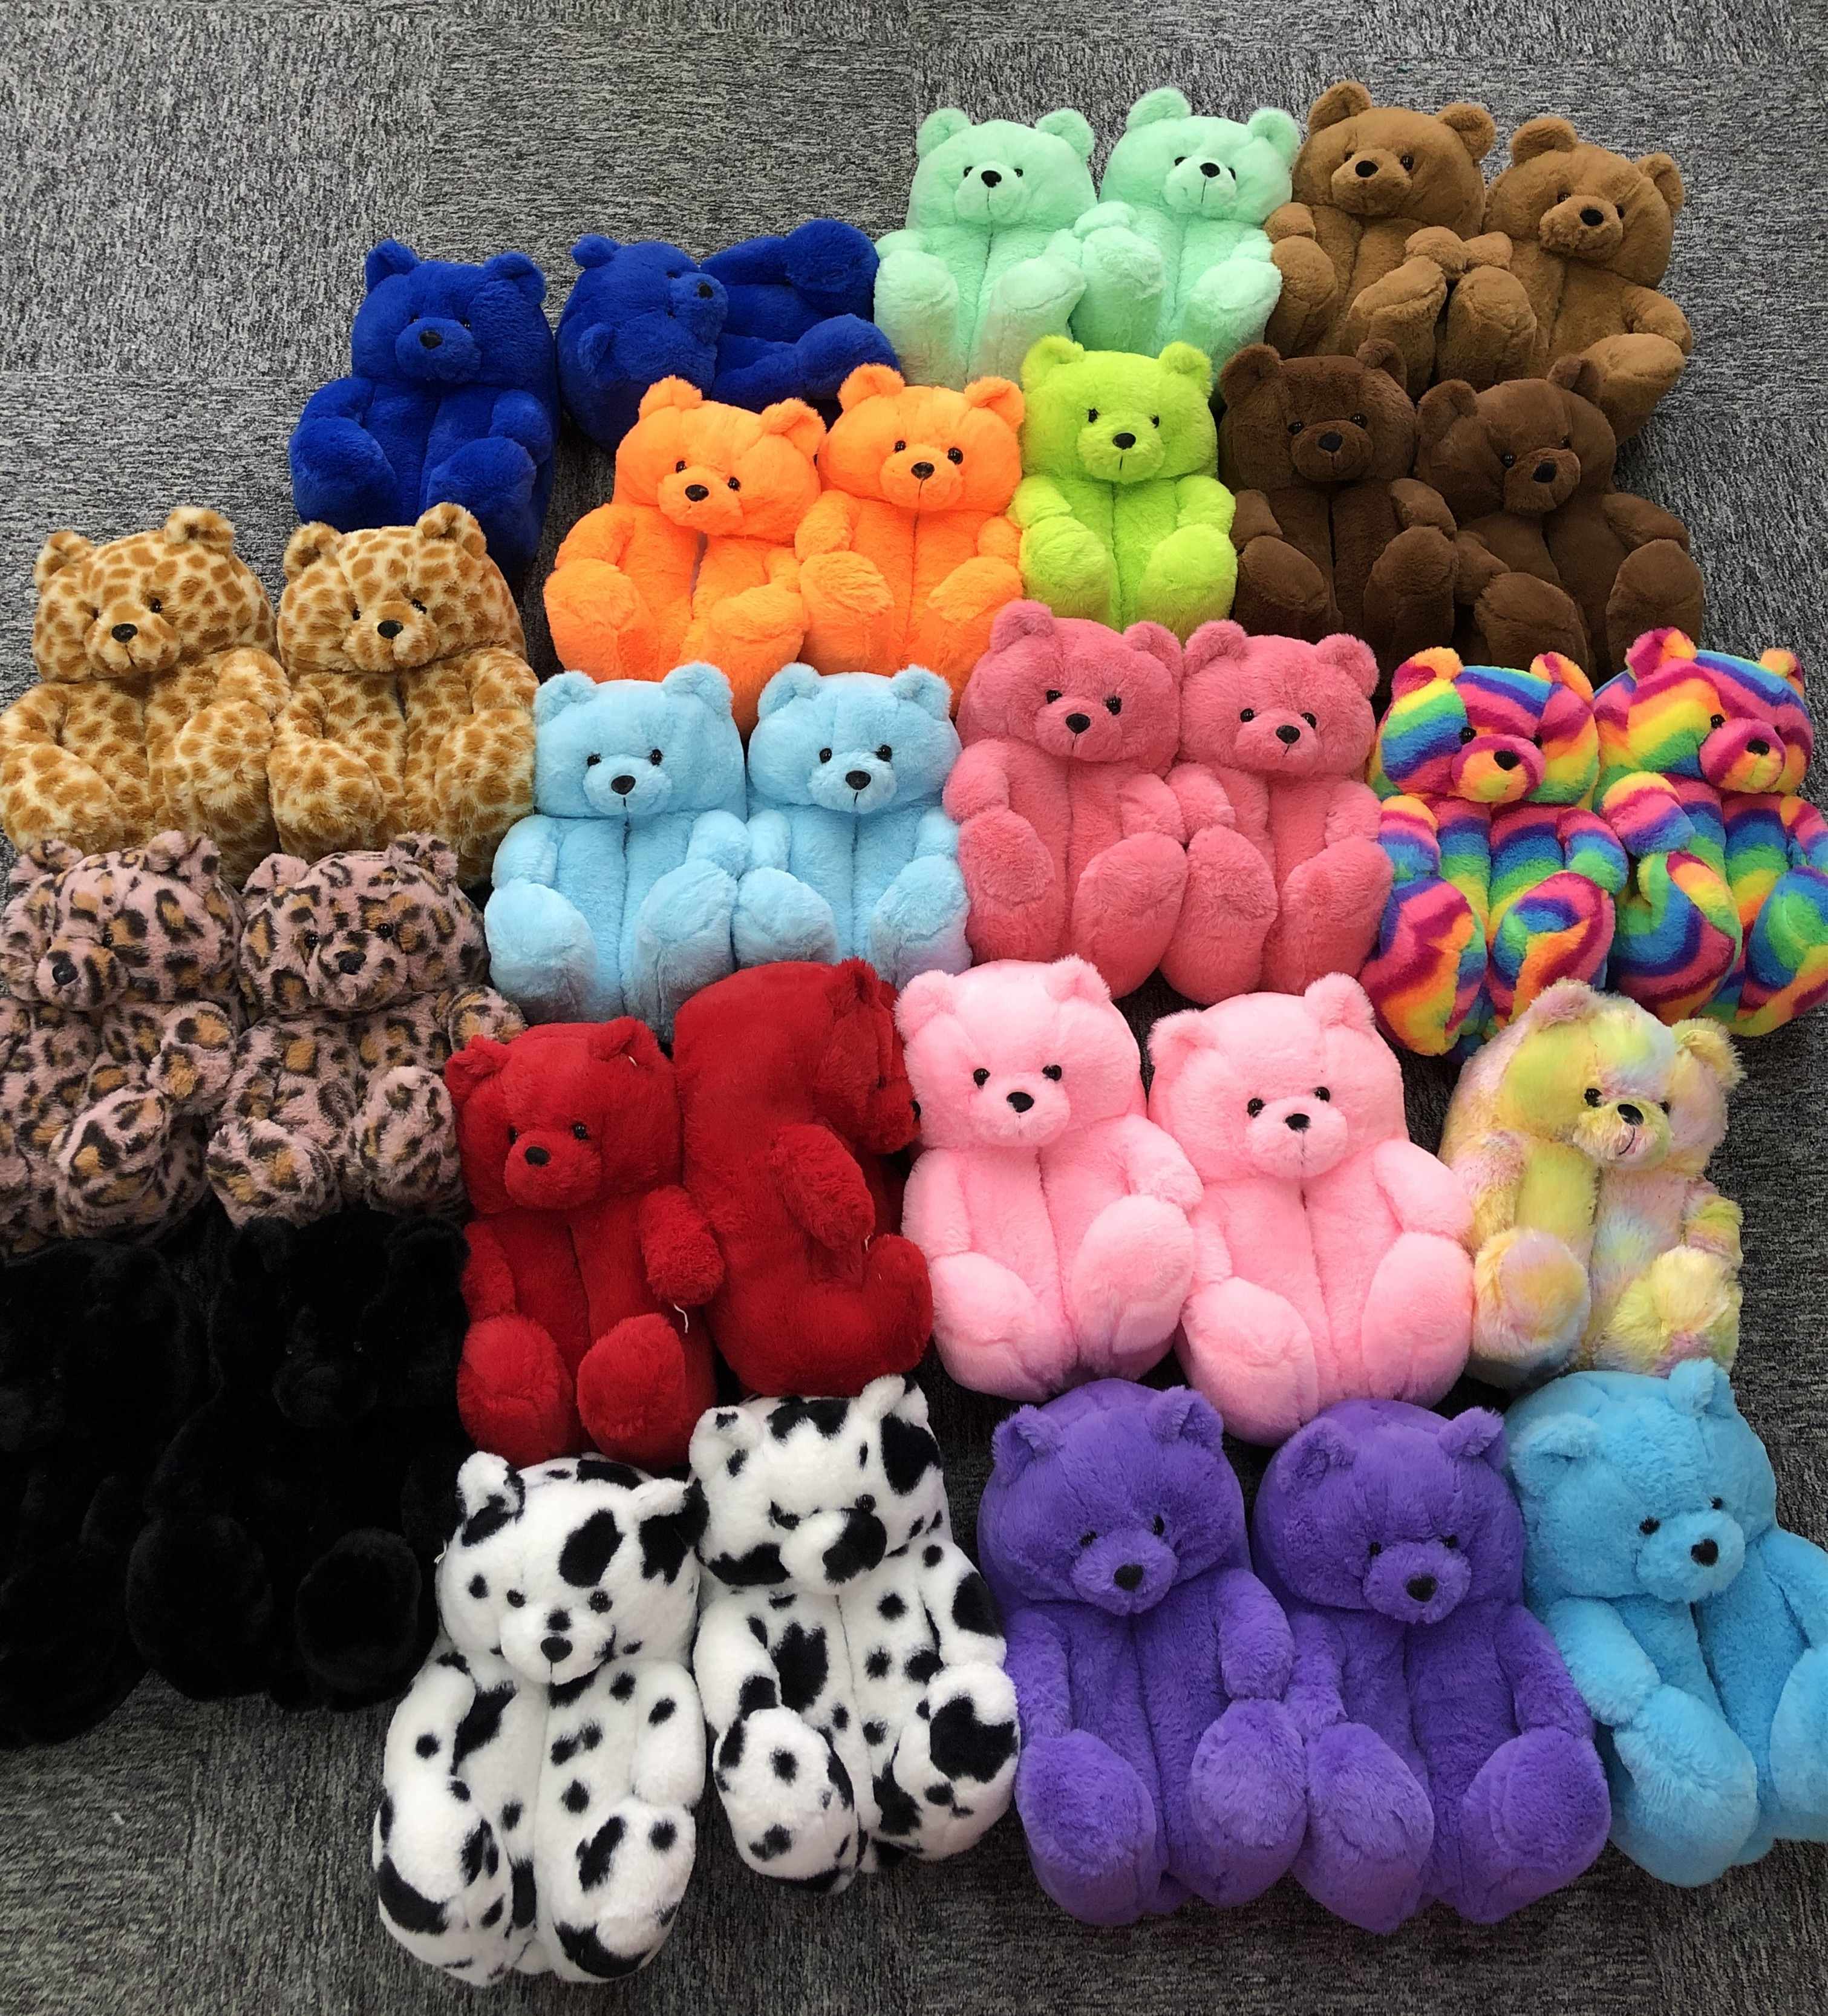 Plush Teddy Bear House Slippers Brown Women Home Indoor Soft Anti-slip Faux Fur Cute Fluffy home slippers Women Winter Warm Shoe